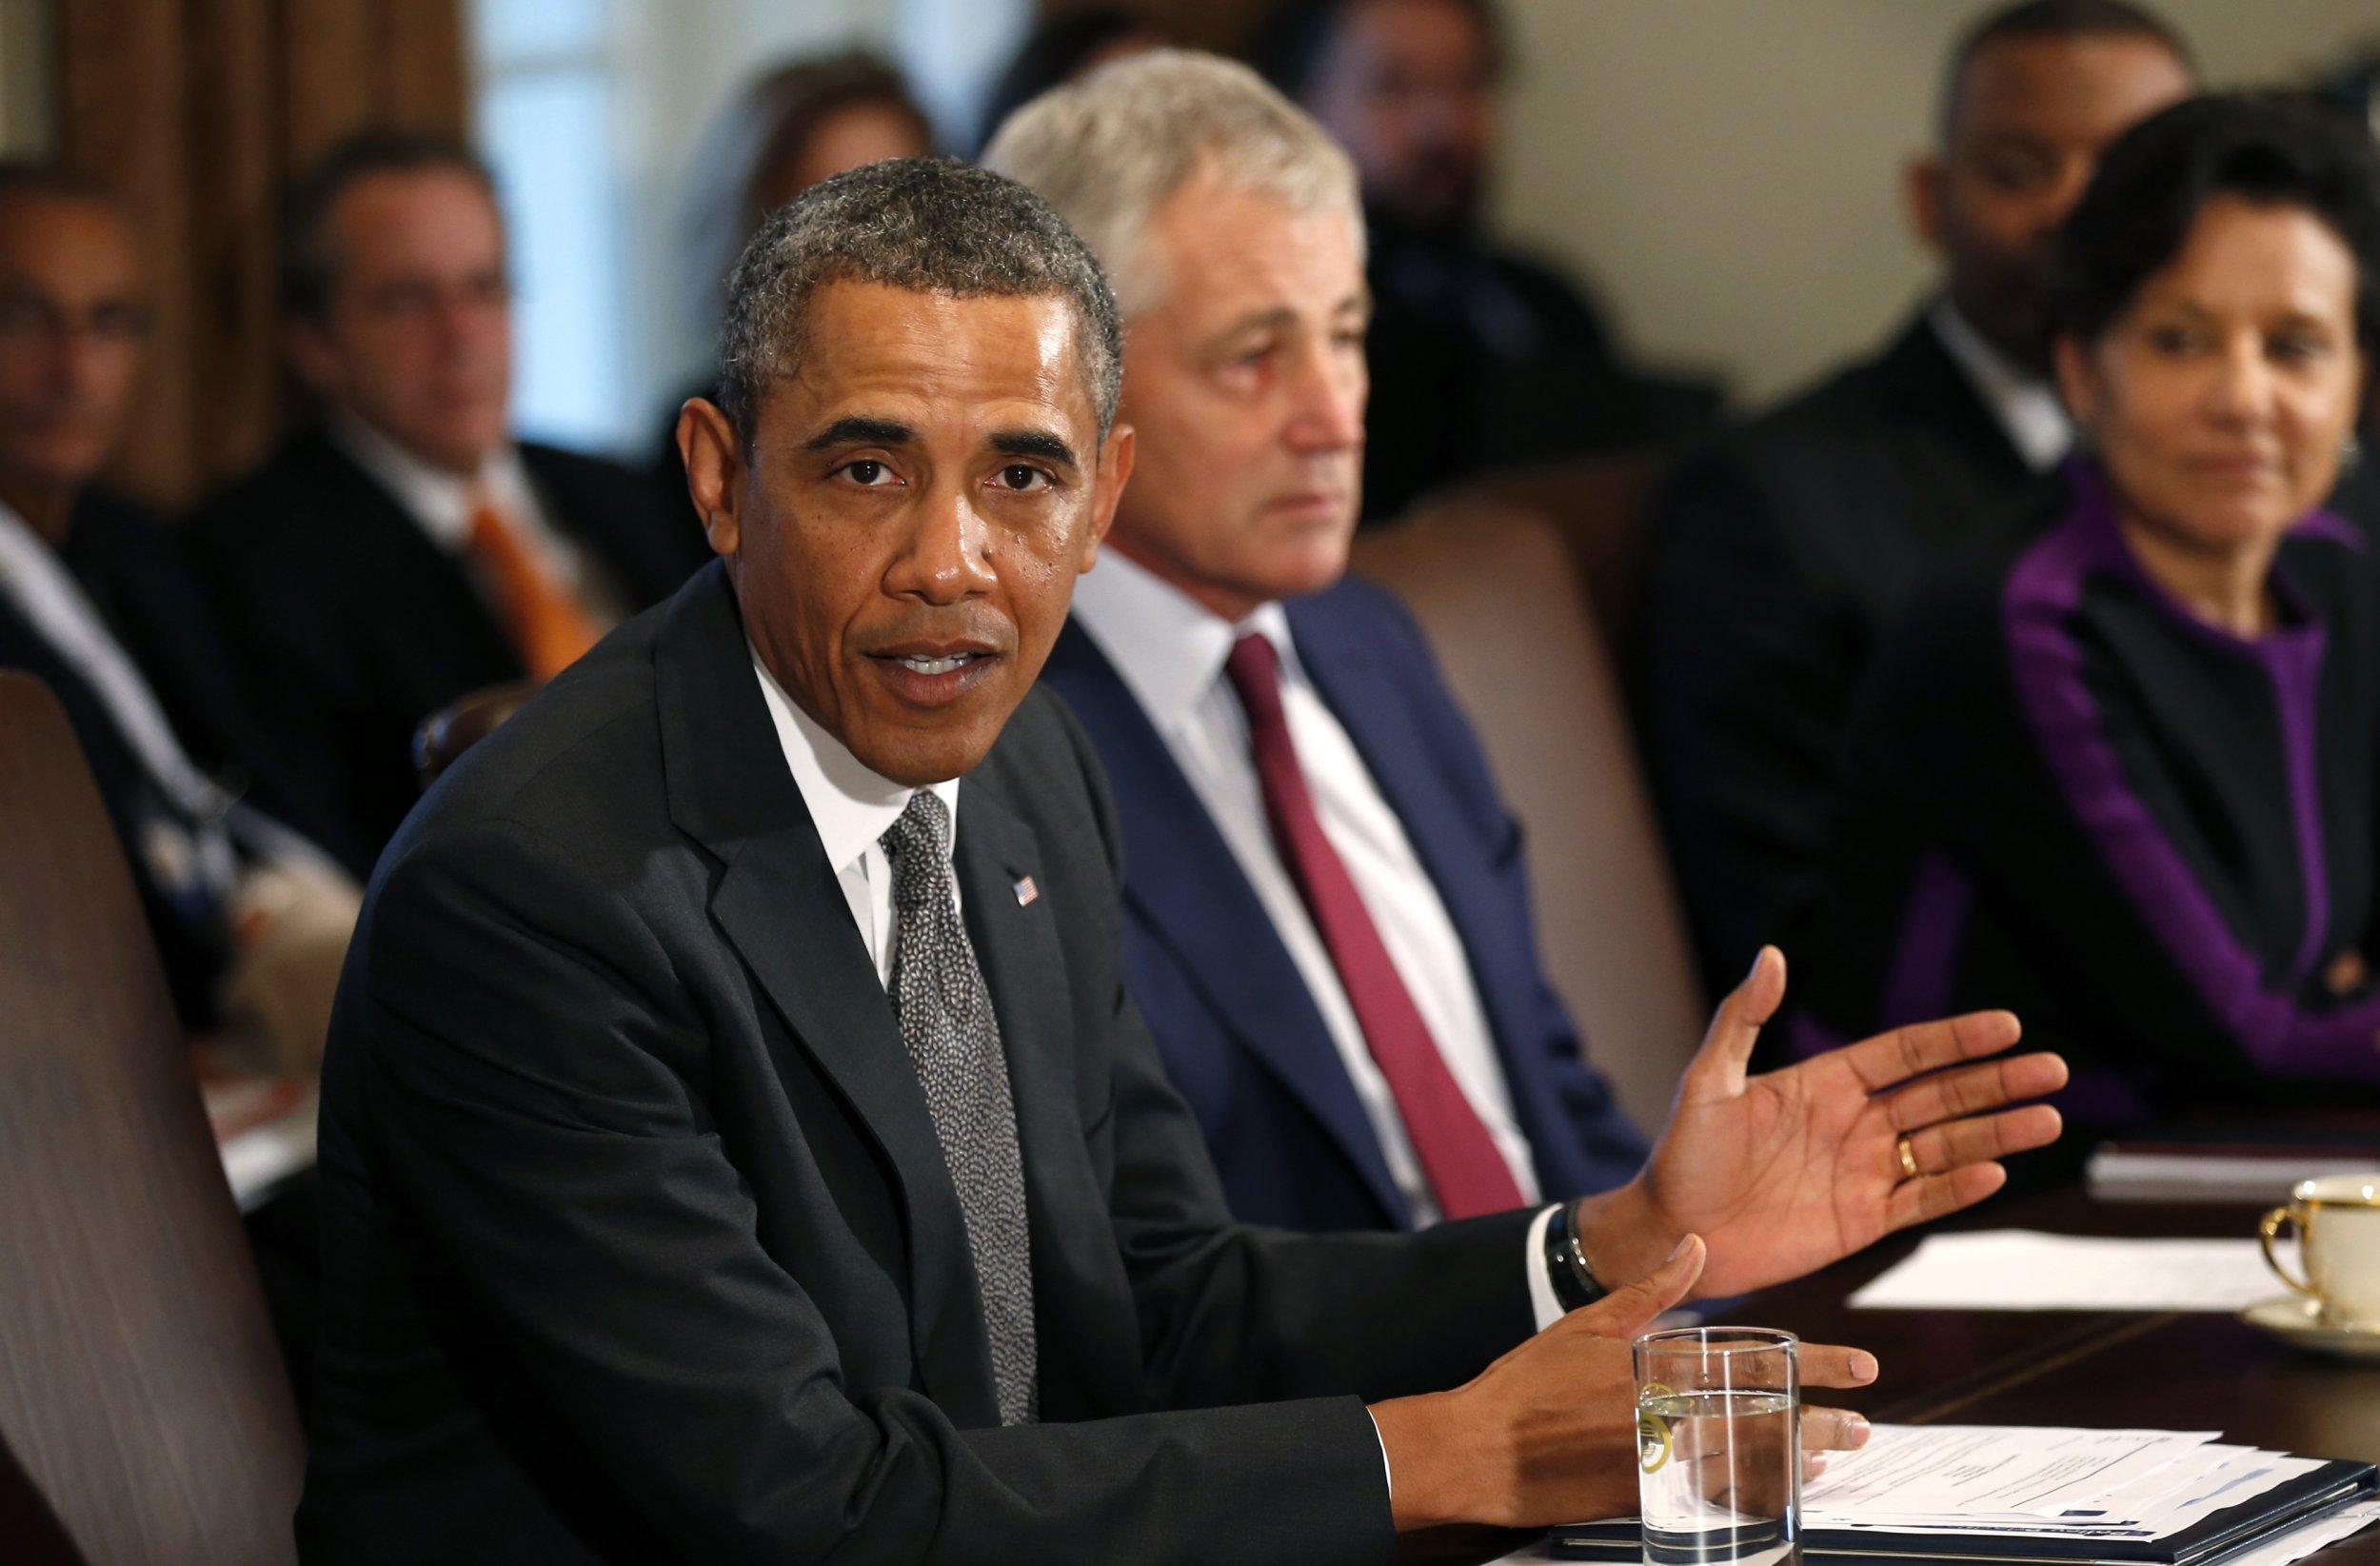 President Obama cabinet meeting